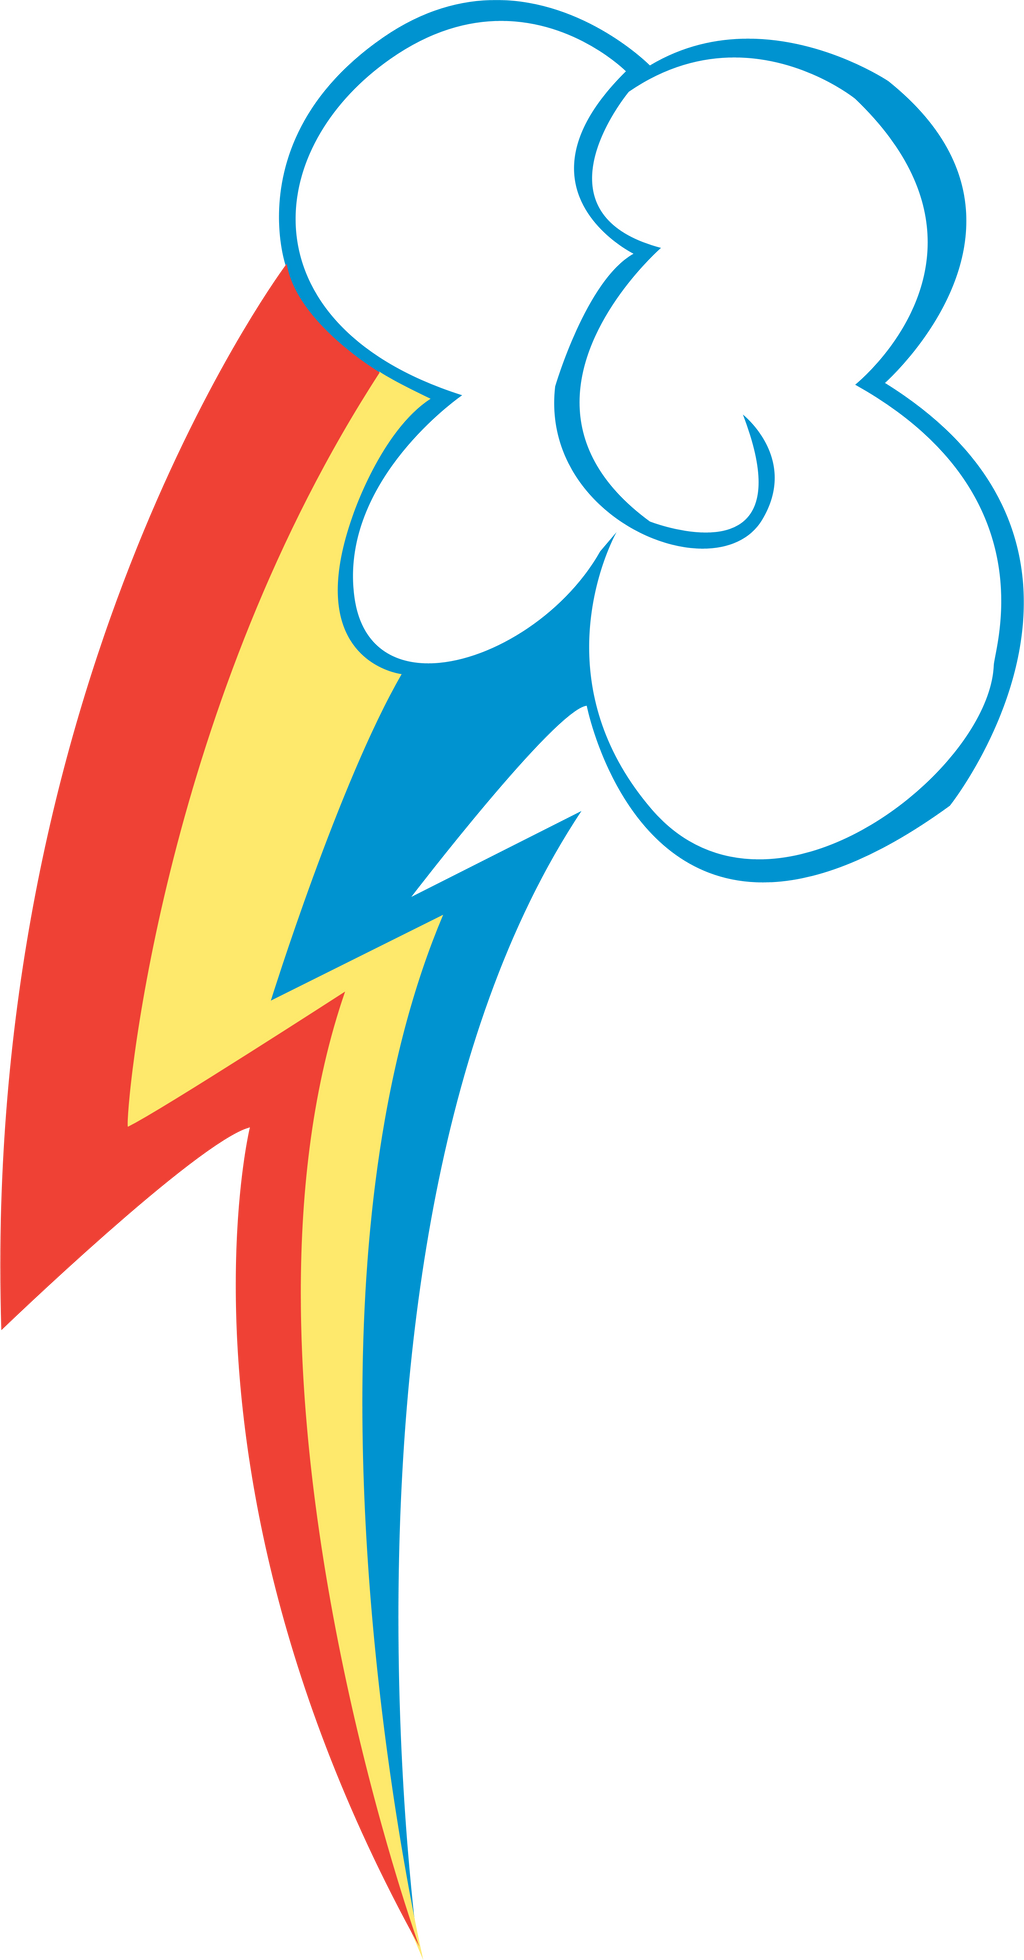 RainbowDash (for MattDash)   Publish with Glogster!